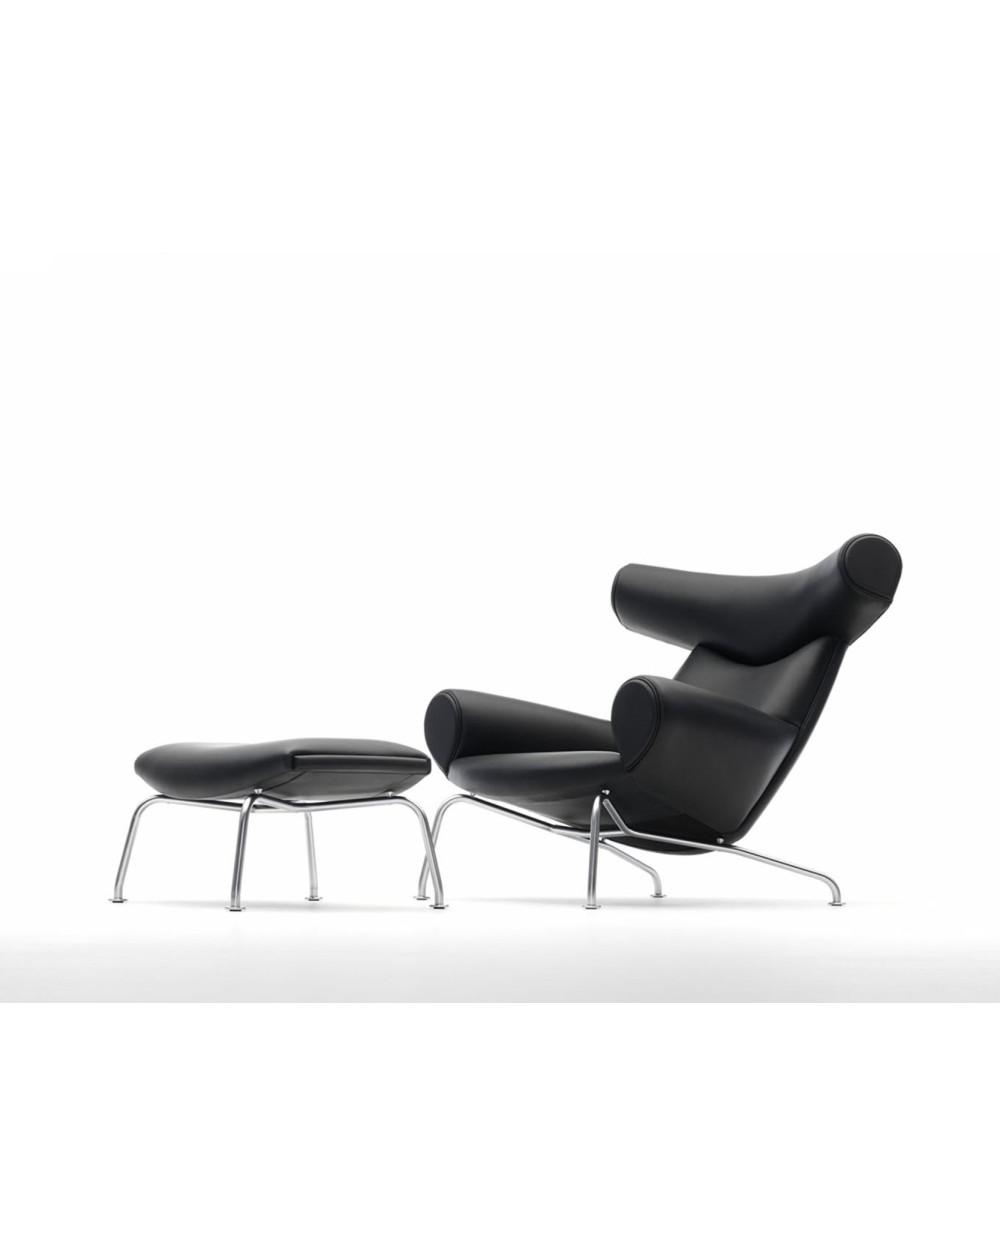 Fauteuil OX, design Hans J. Wegner